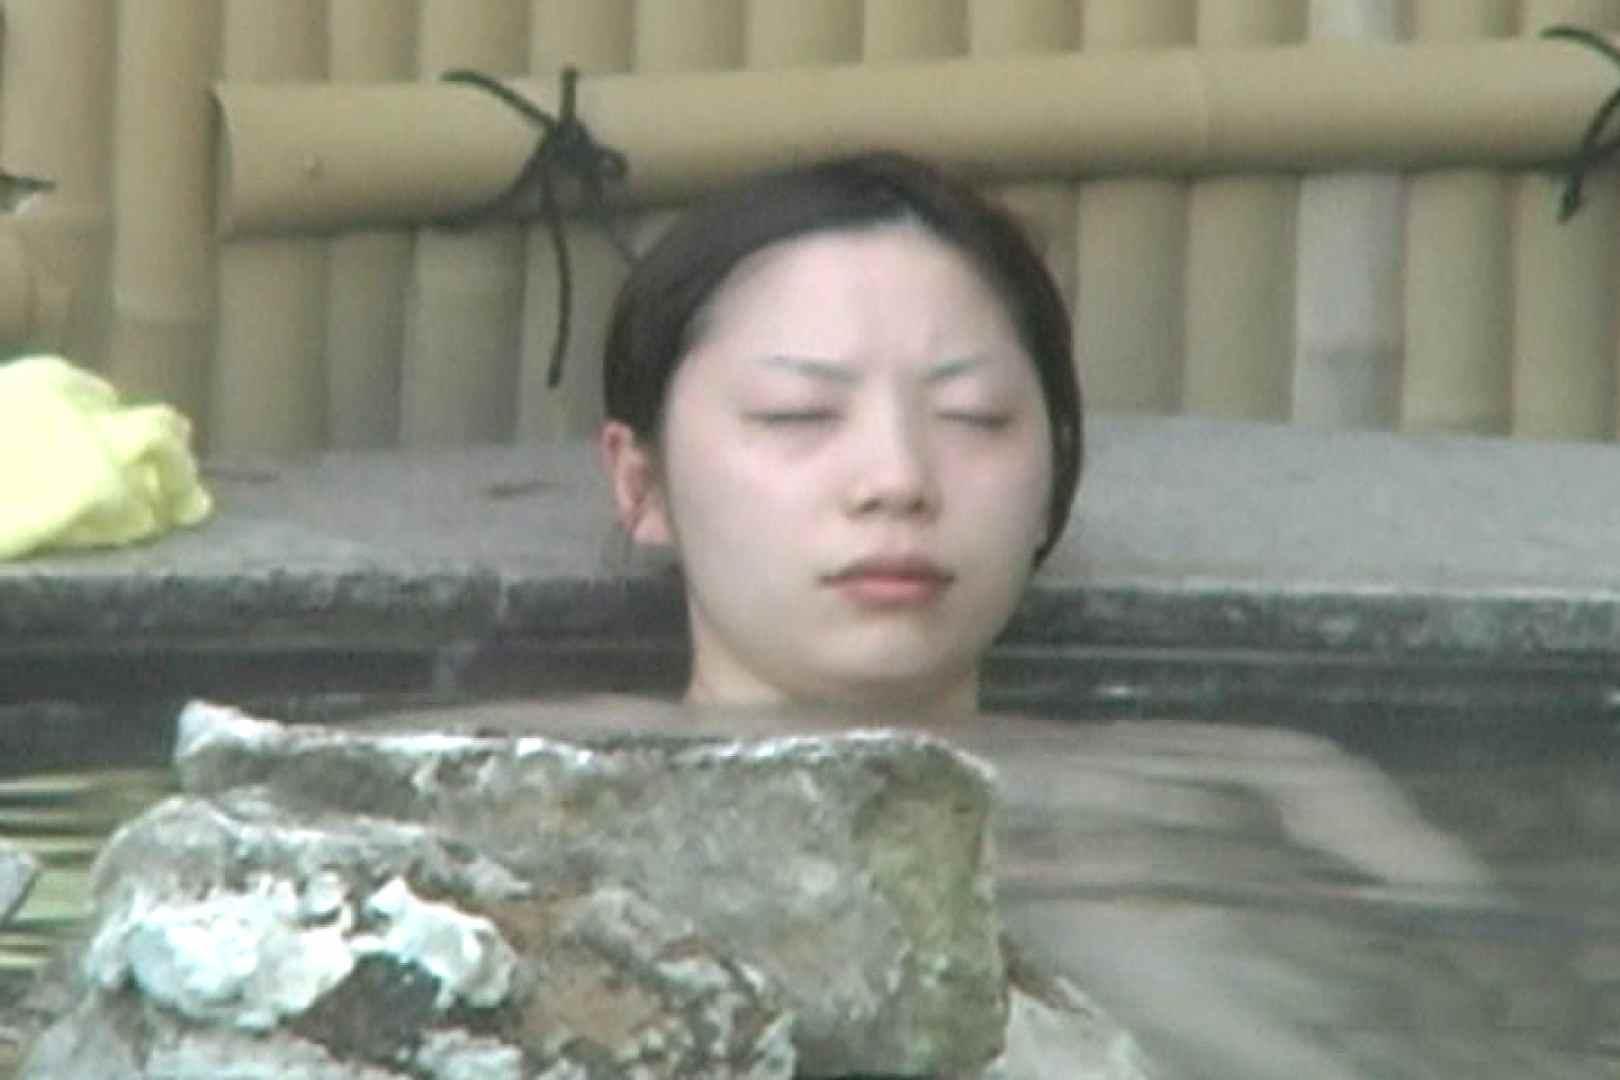 Aquaな露天風呂Vol.596 盗撮シリーズ | 露天風呂編  113PIX 99